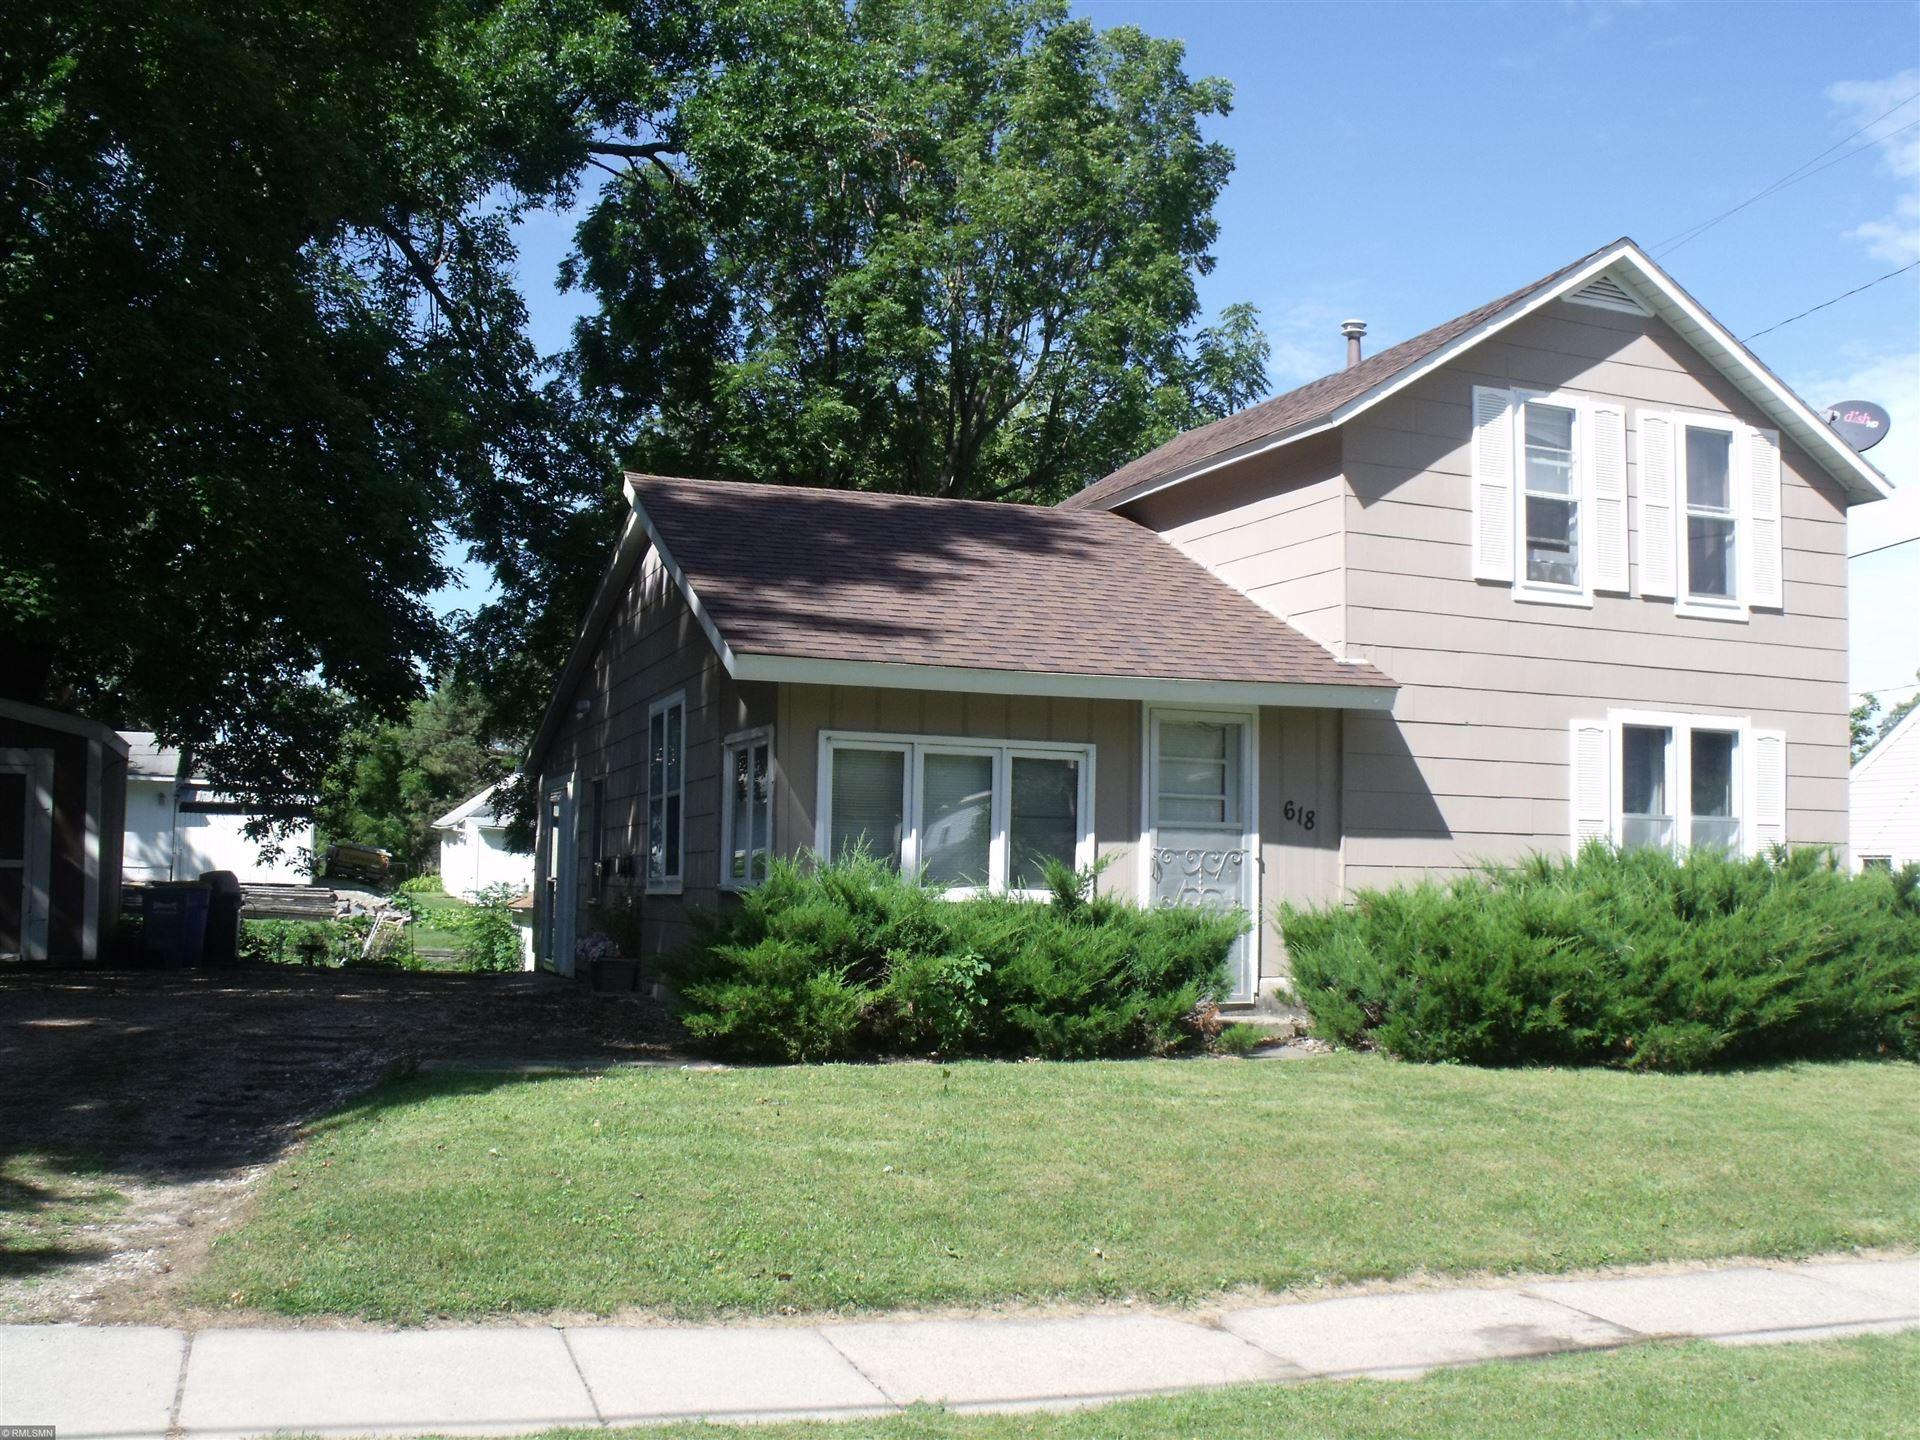 618 S Elm Avenue, Owatonna, MN 55060 - MLS#: 5650761